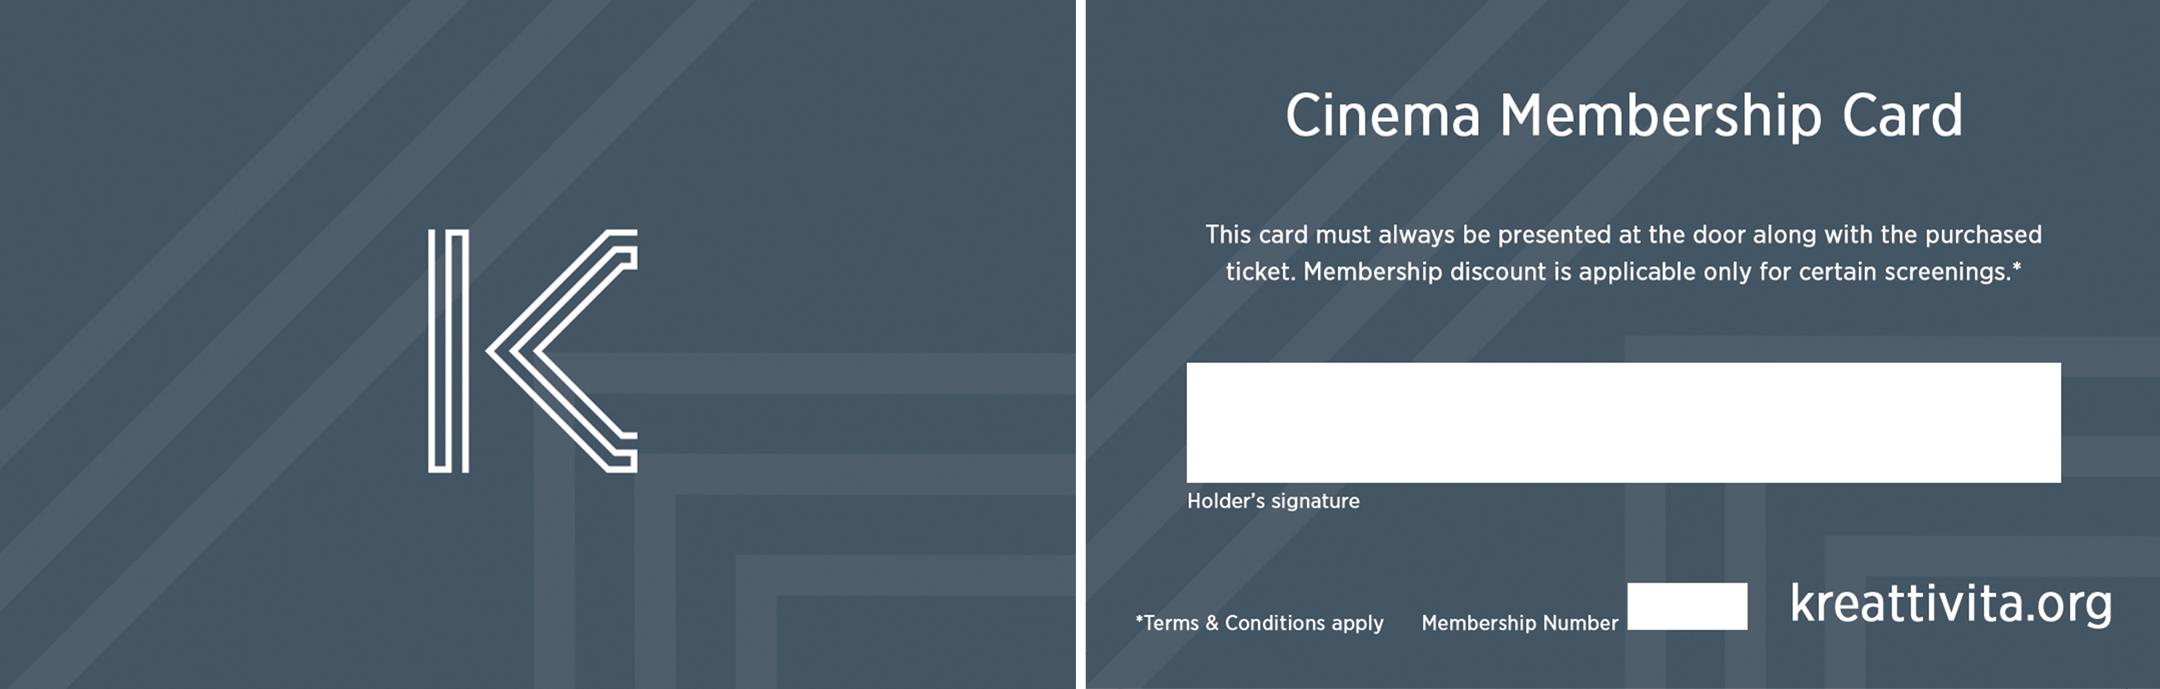 Cinema Membership Card